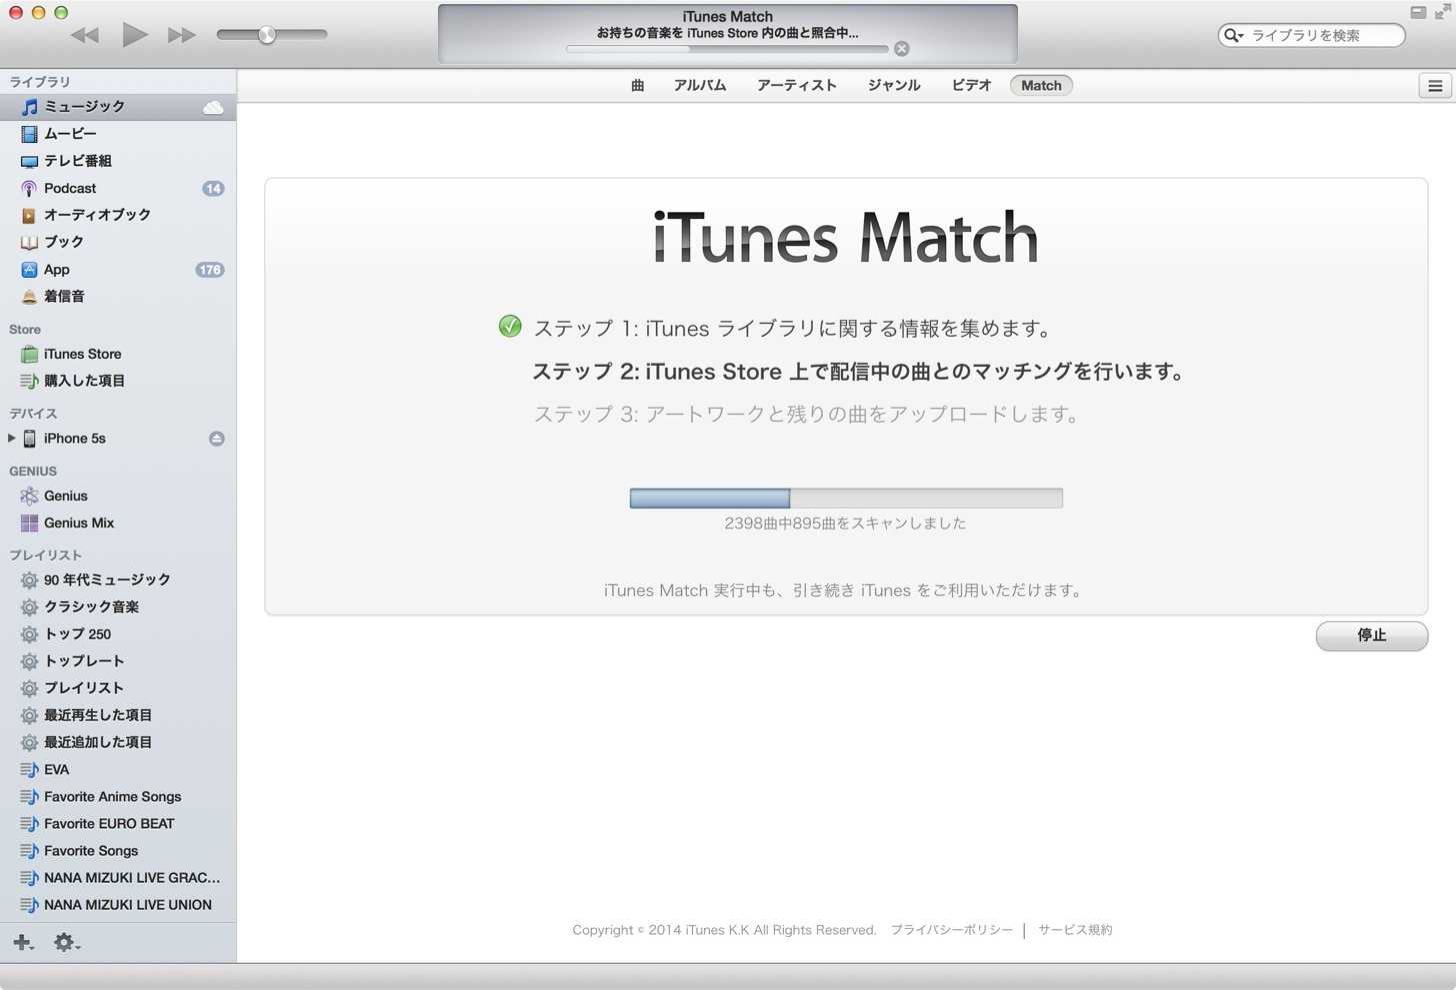 iTunes Store 上で配信中の曲とのマッチングを行います。